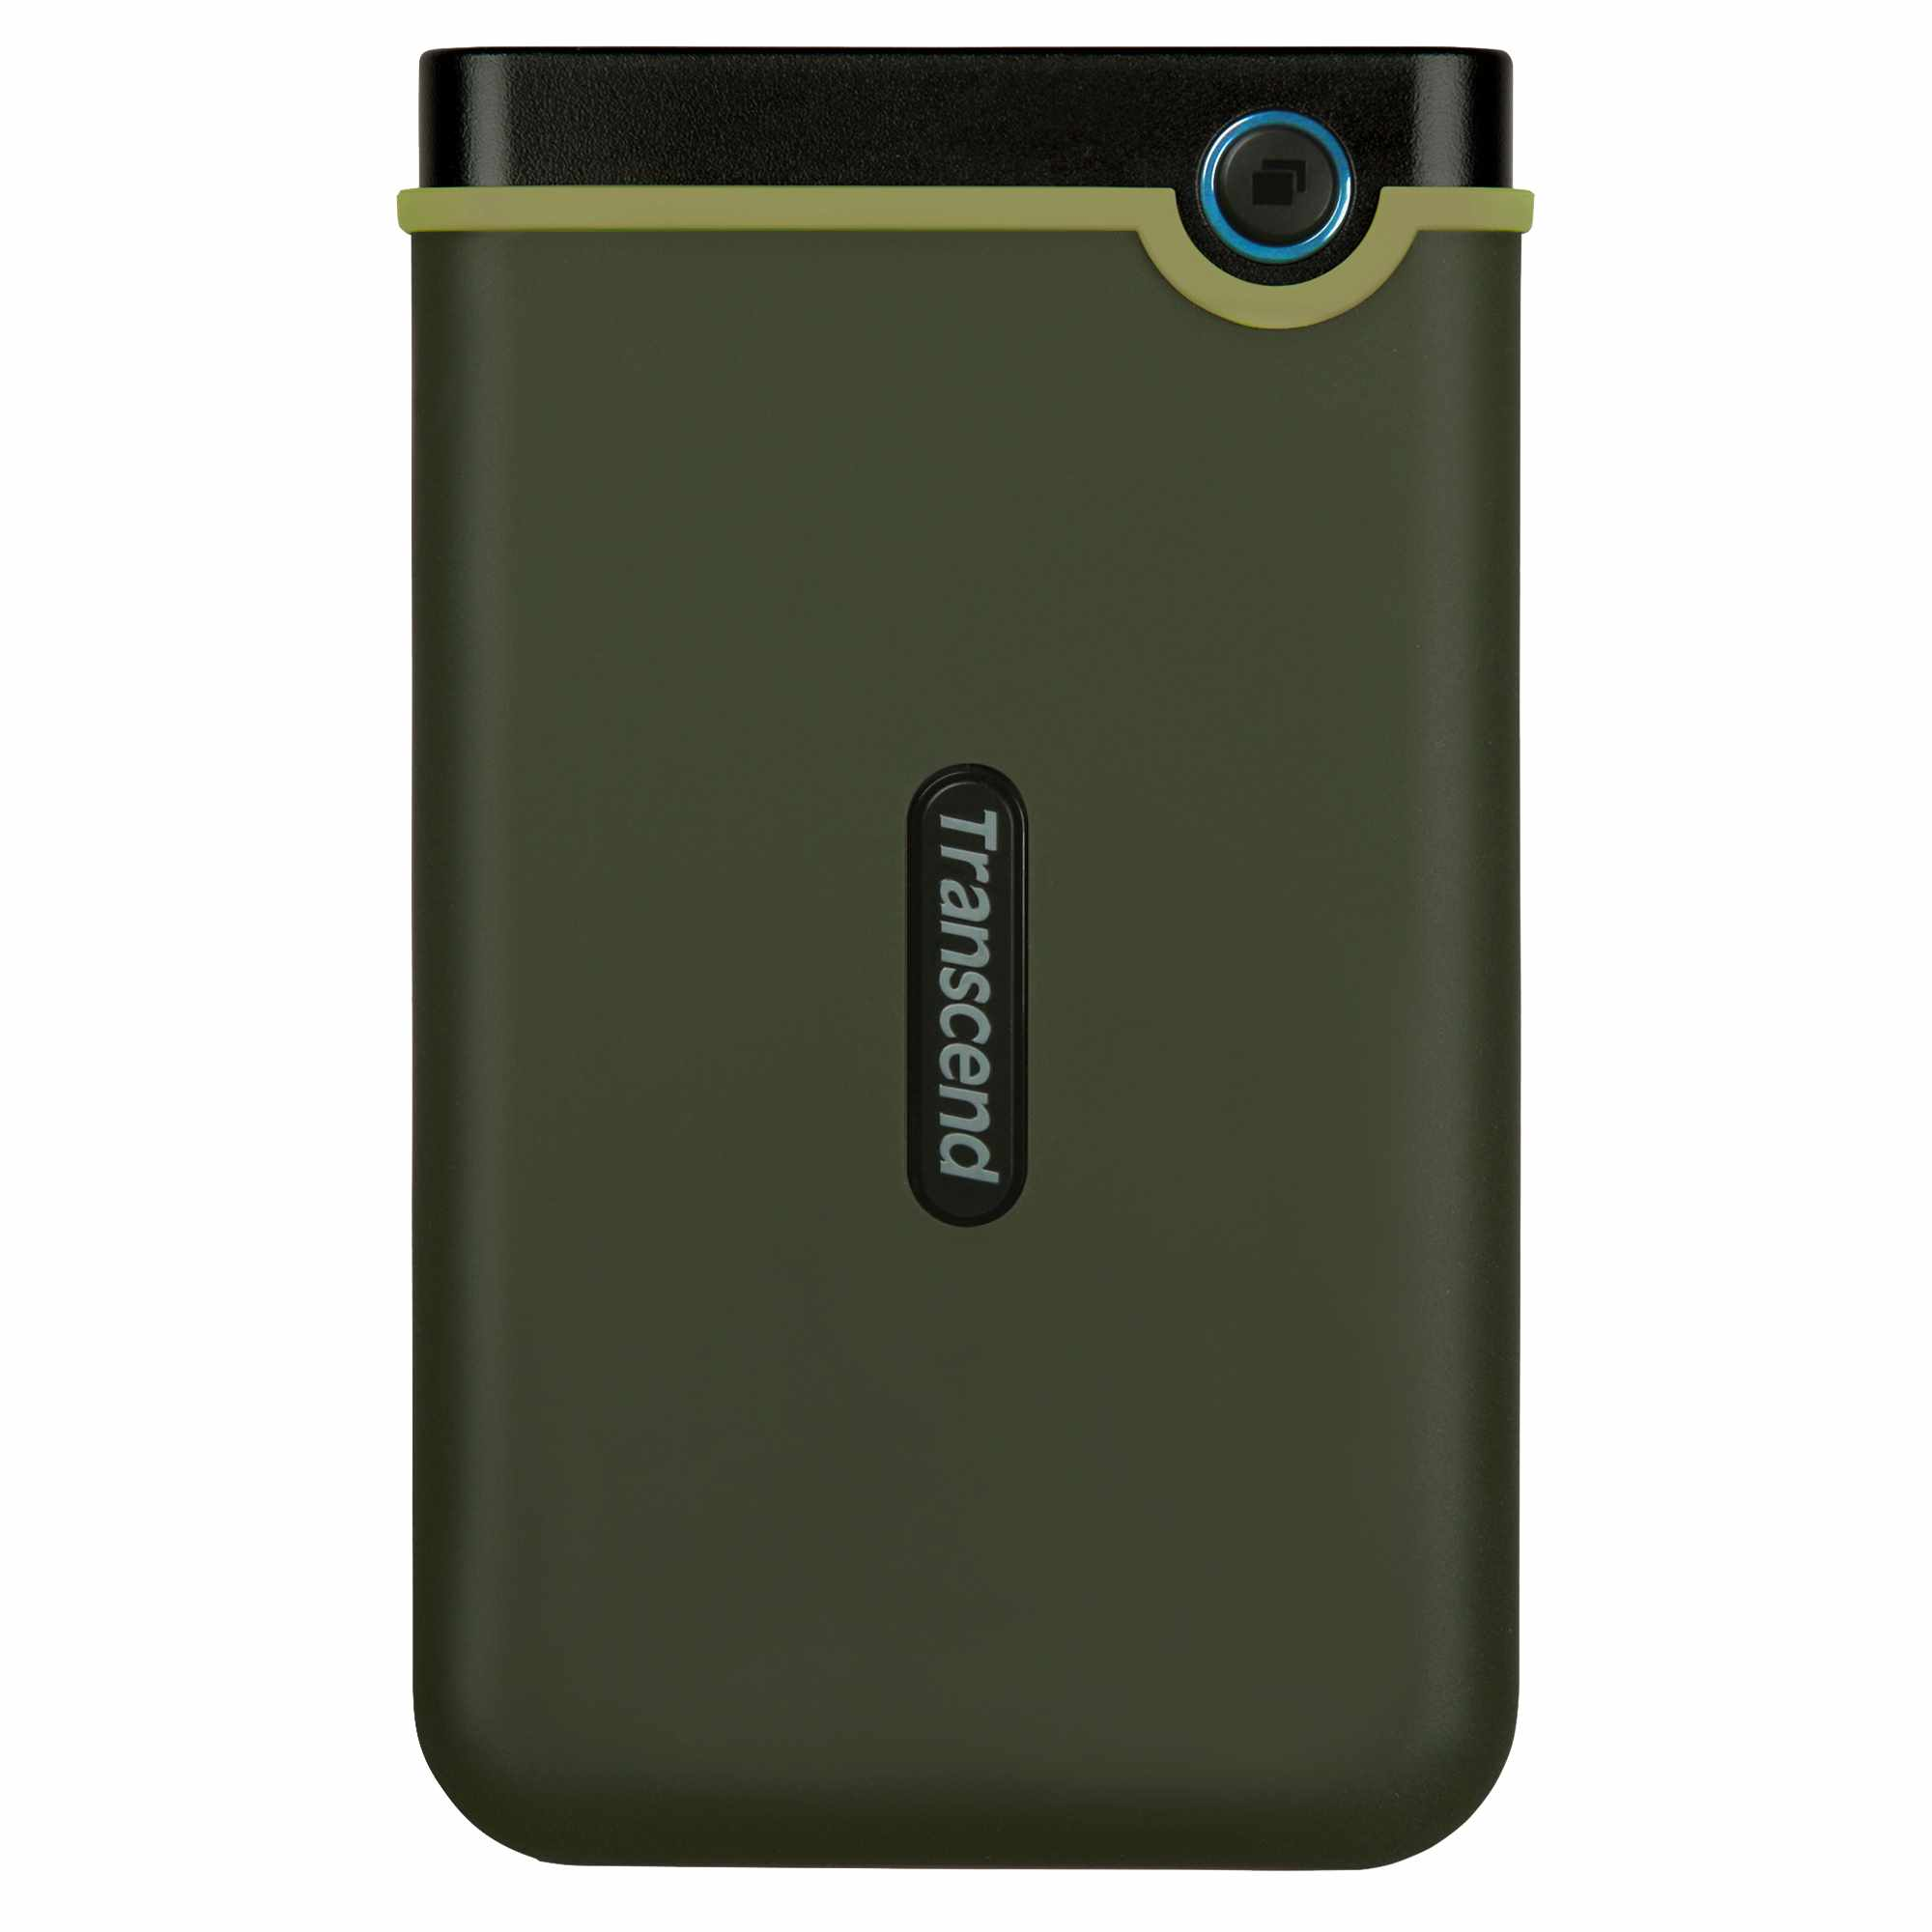 "TRANSCEND externí HDD 2,5"" USB 3.0 StoreJet 25M3G, Slim, 2TB, Black (SATA, Rubber Case, Anti-Shock)"